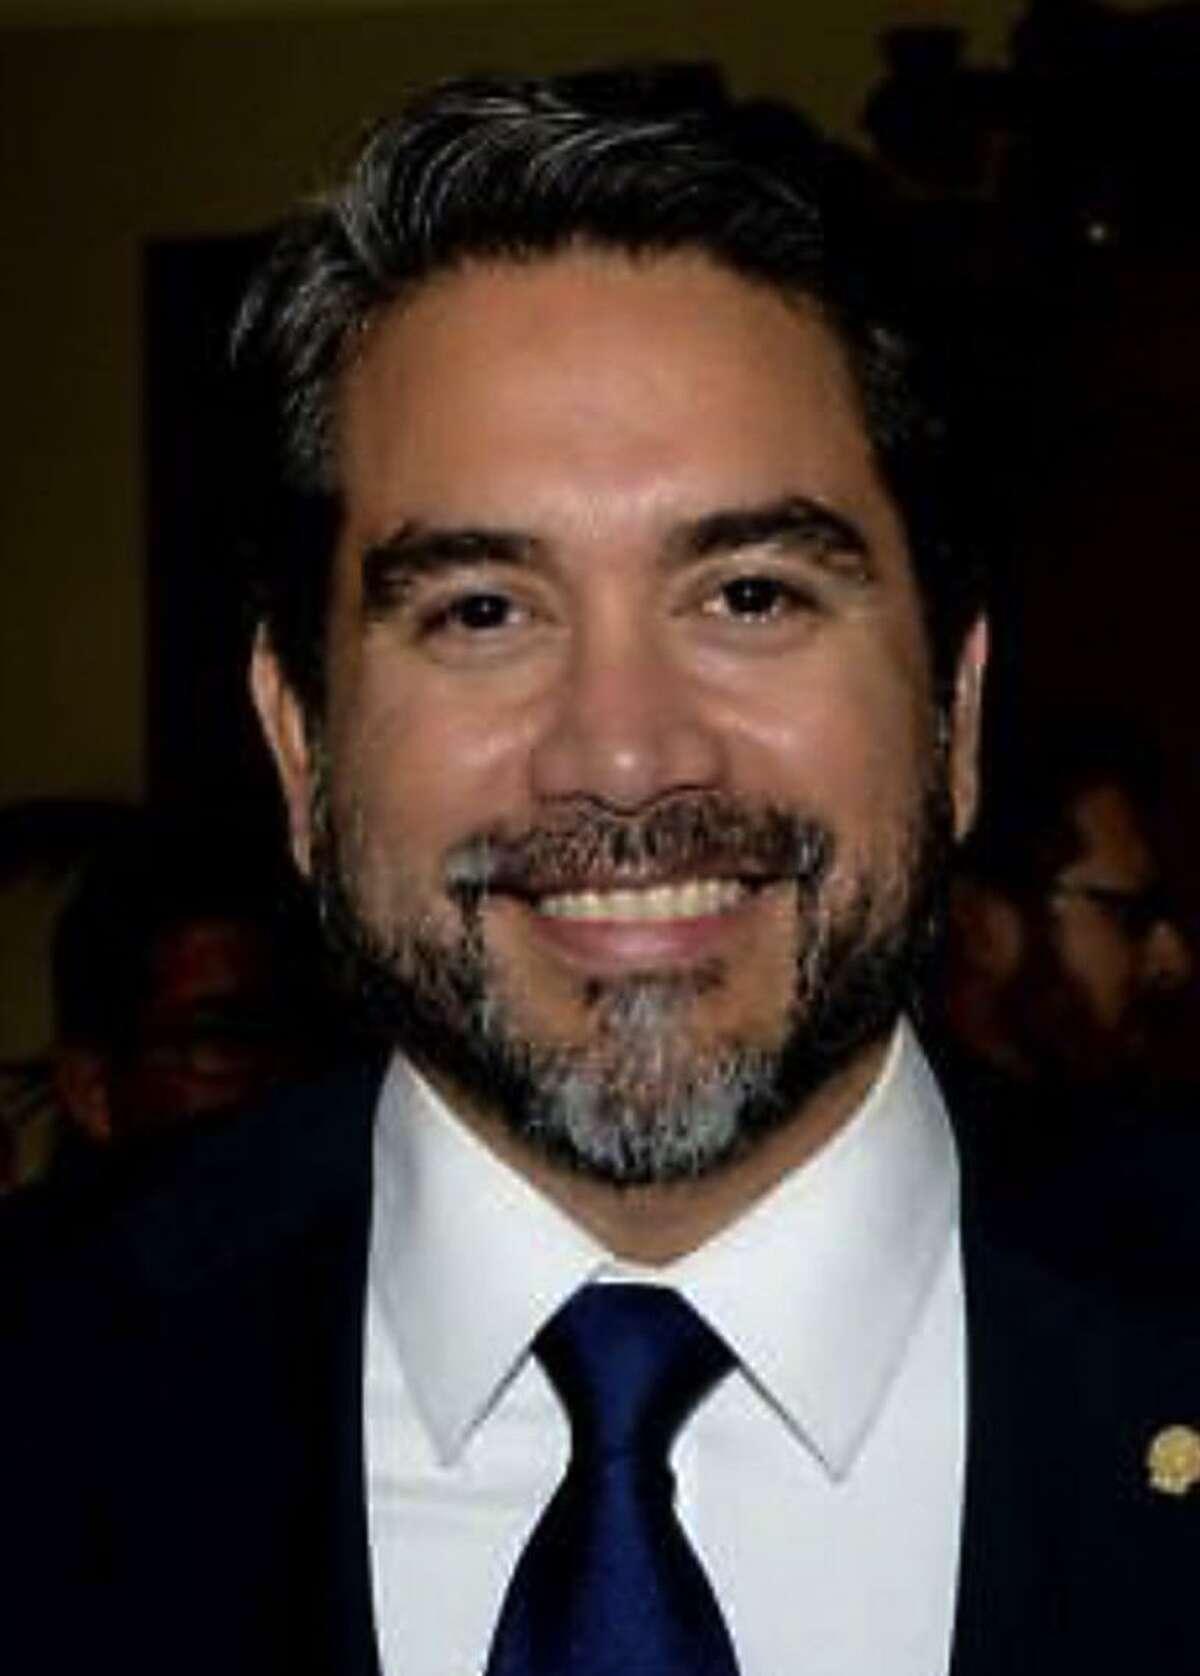 District 1 Candidate - Roberto Treviño. (Incumbent).